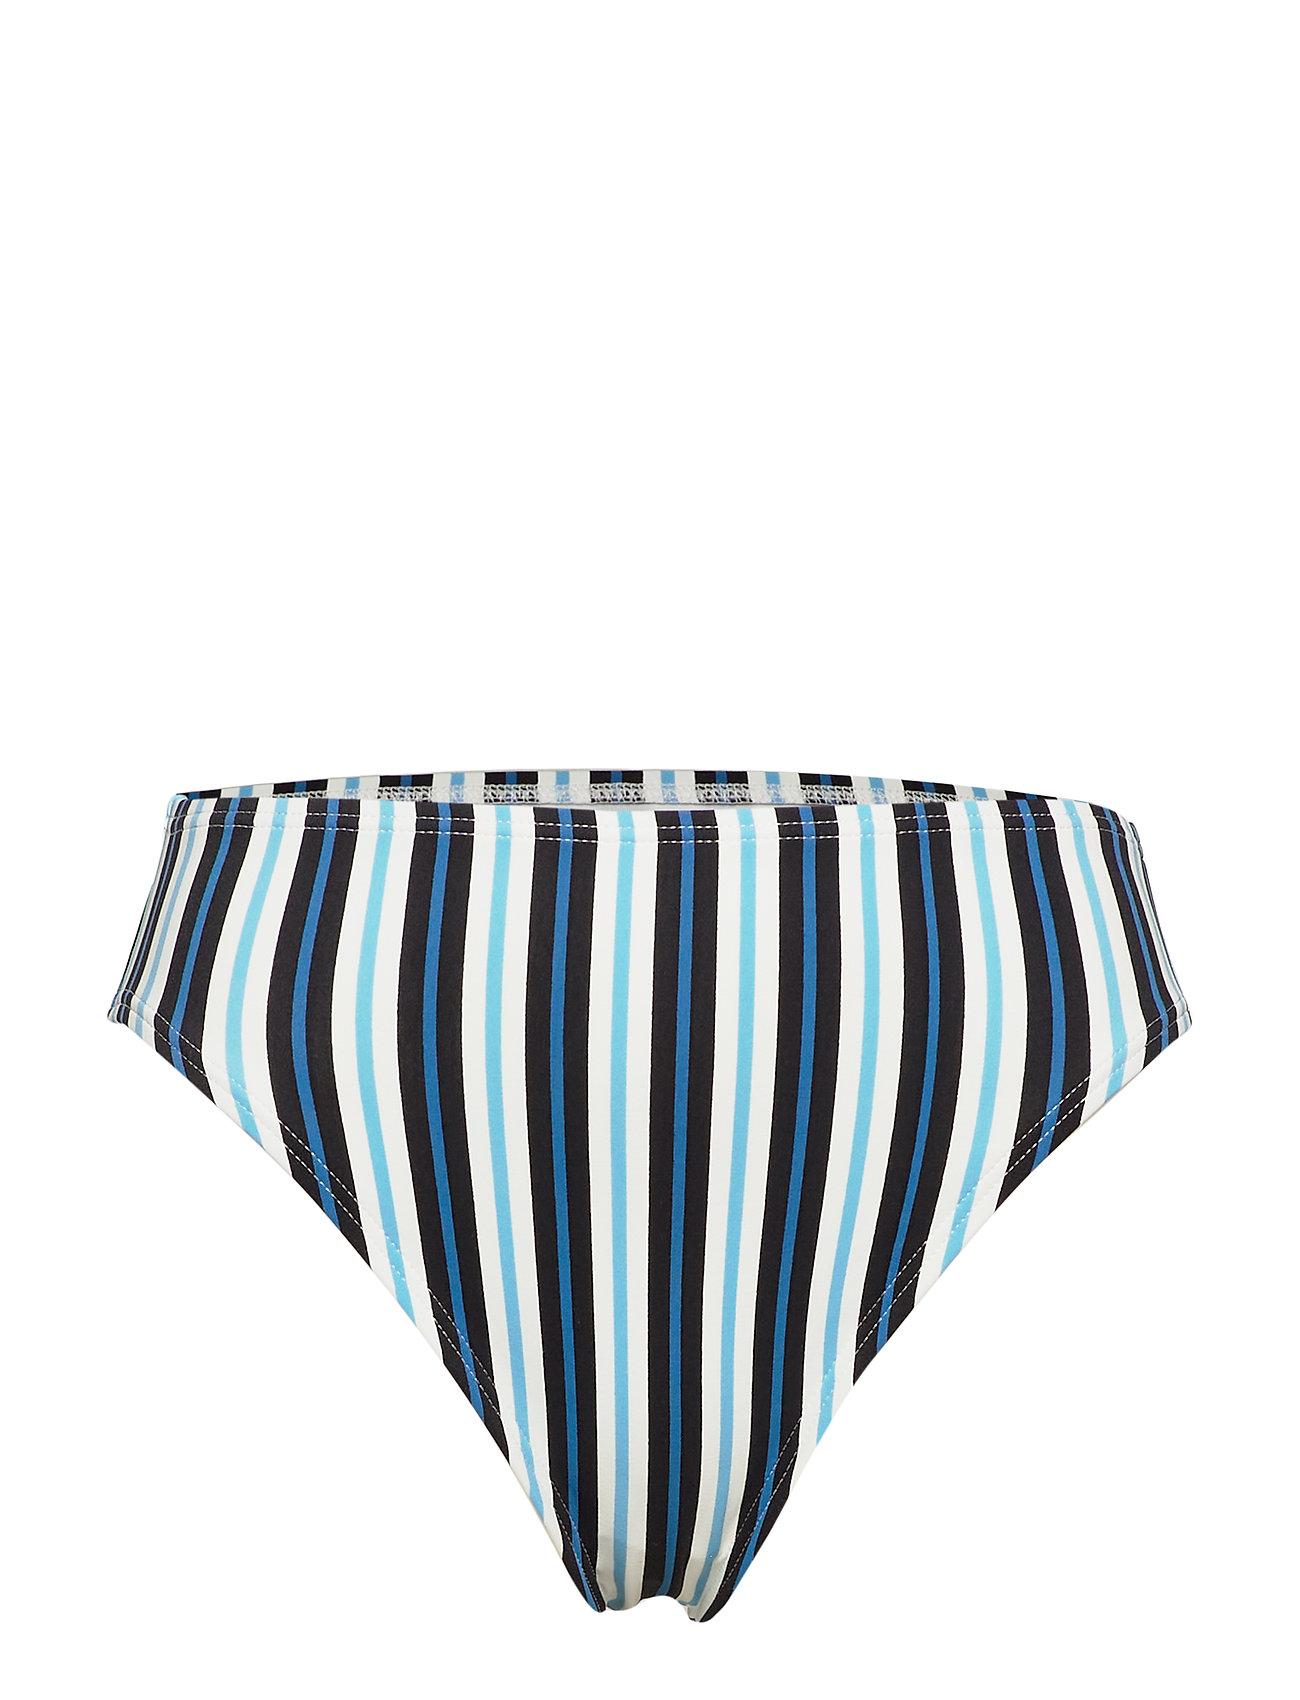 Michael Kors Swimwear HI WAIST BTM - BLACK MULTI